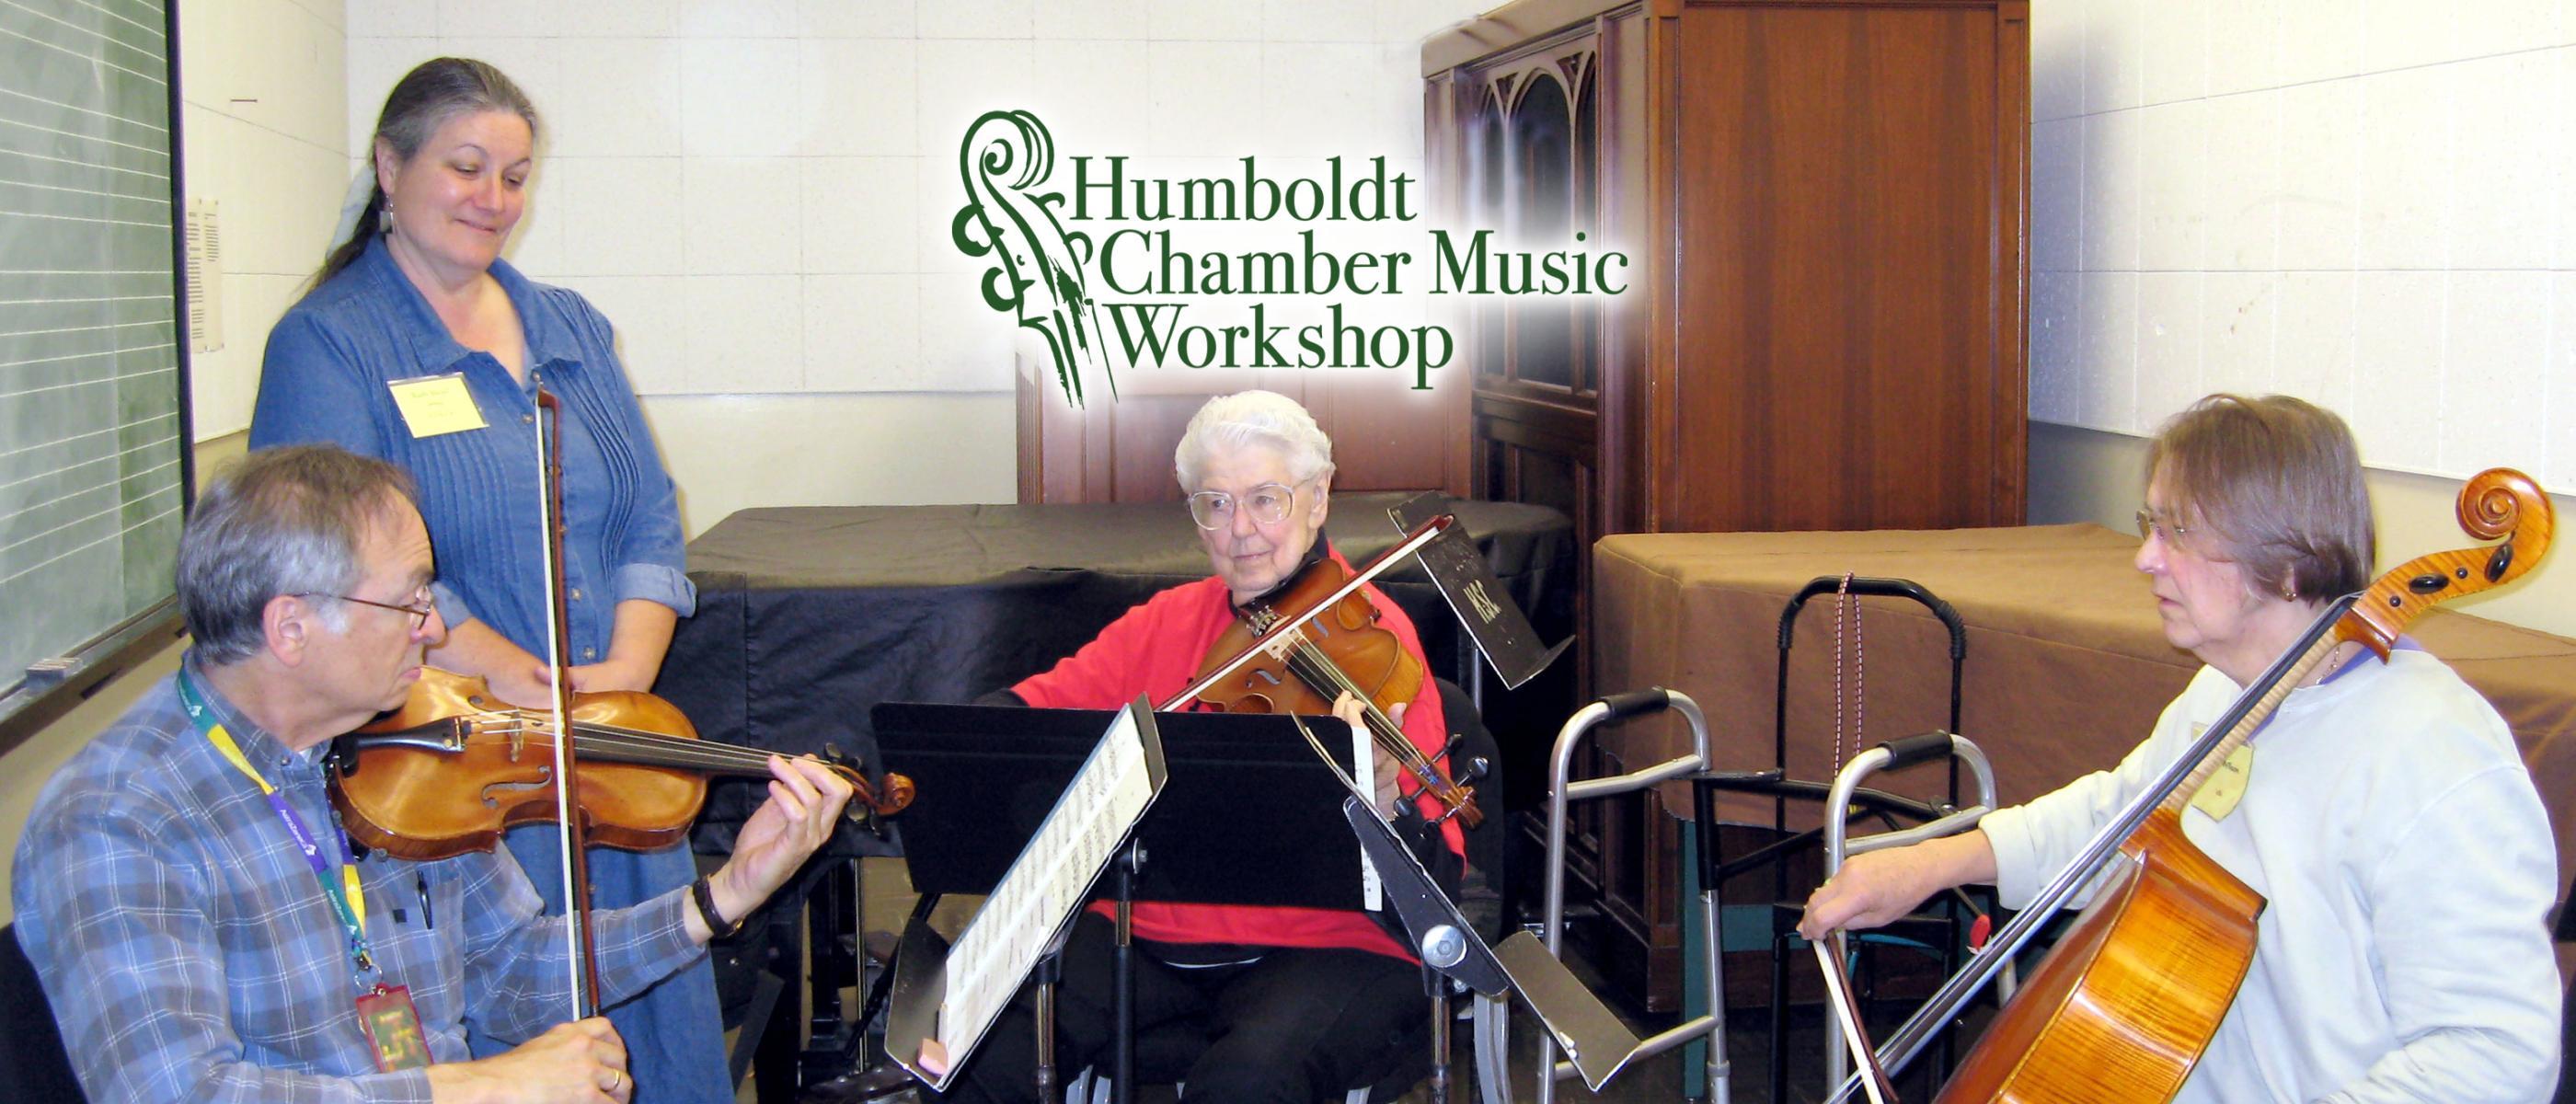 Humboldt Chamber Music Workshop